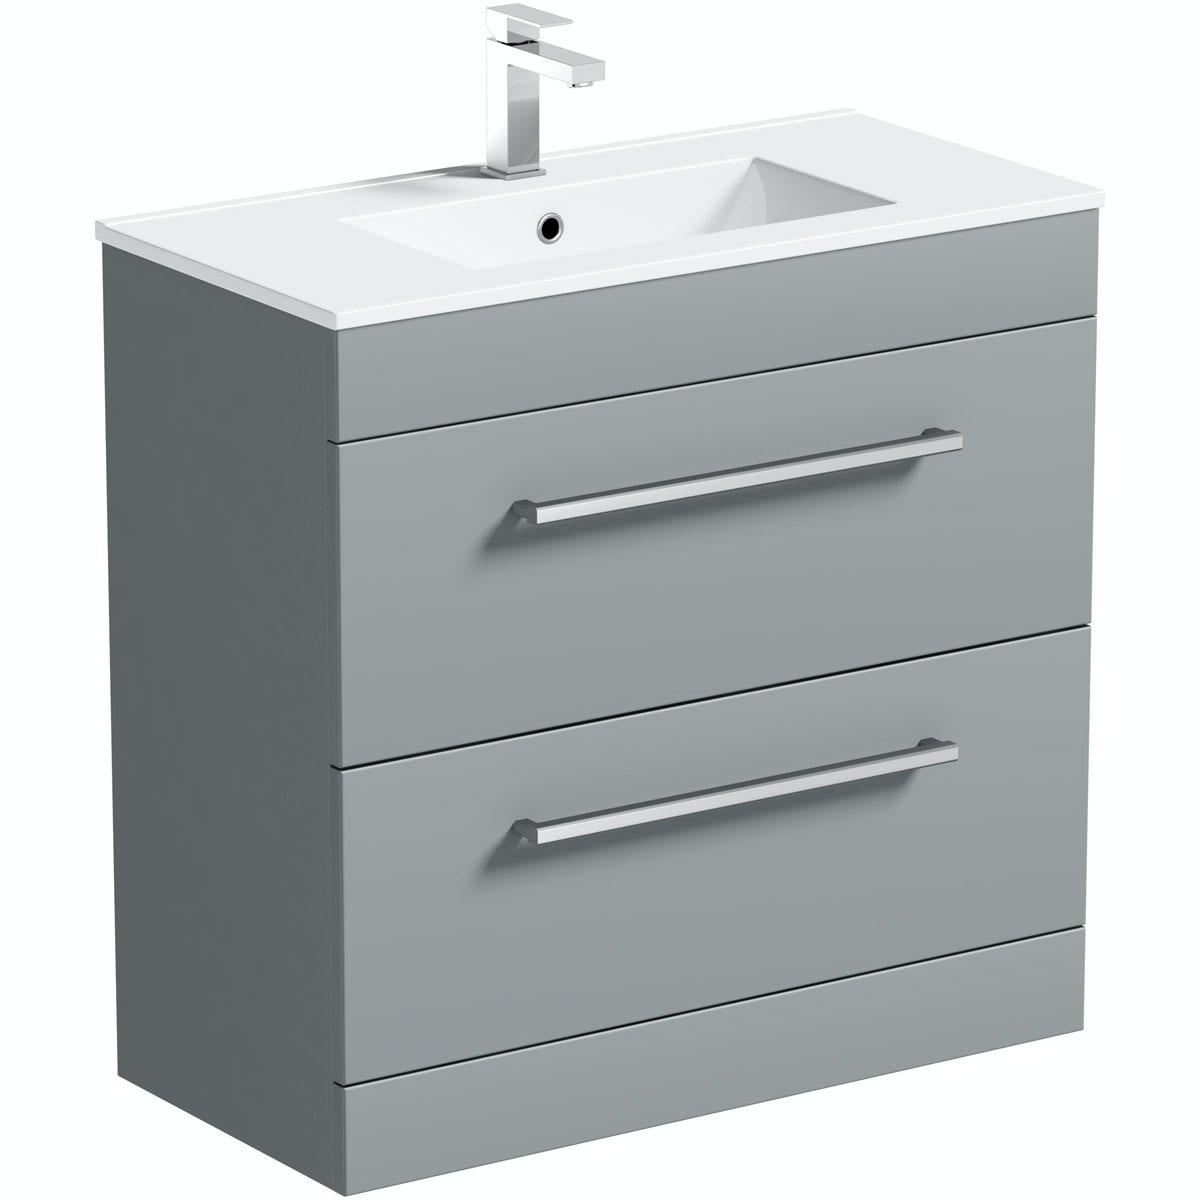 Orchard Derwent grey vanity drawer unit and basin 800mm